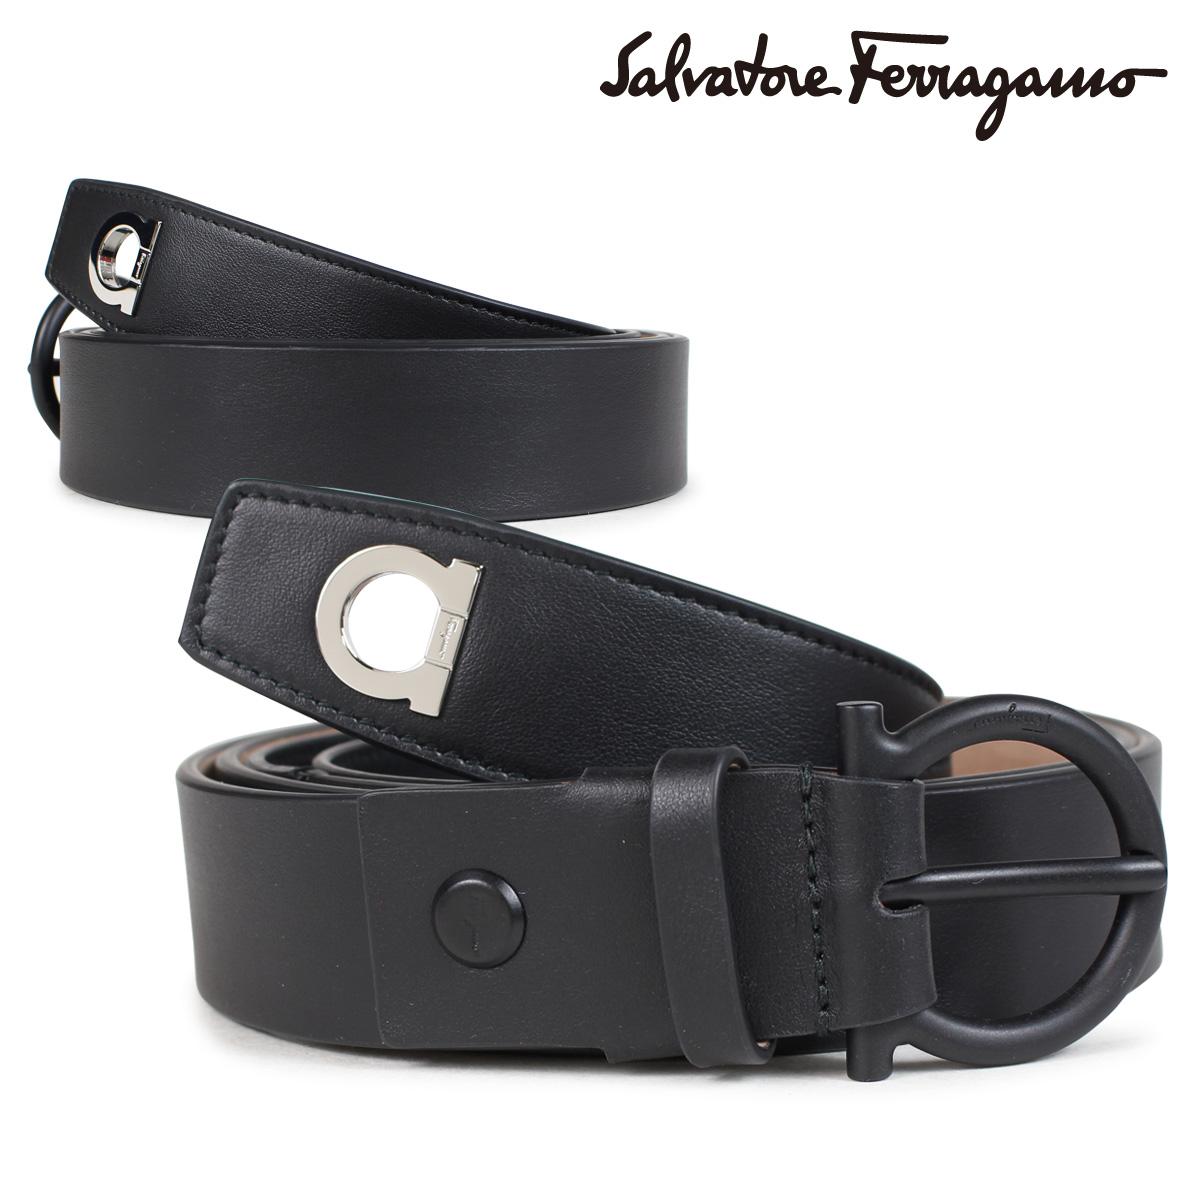 Salvatore Ferragamo ベルト メンズ レザーベルト フェラガモ ADJUSTABLE GANCINI BELT ブラック 679951